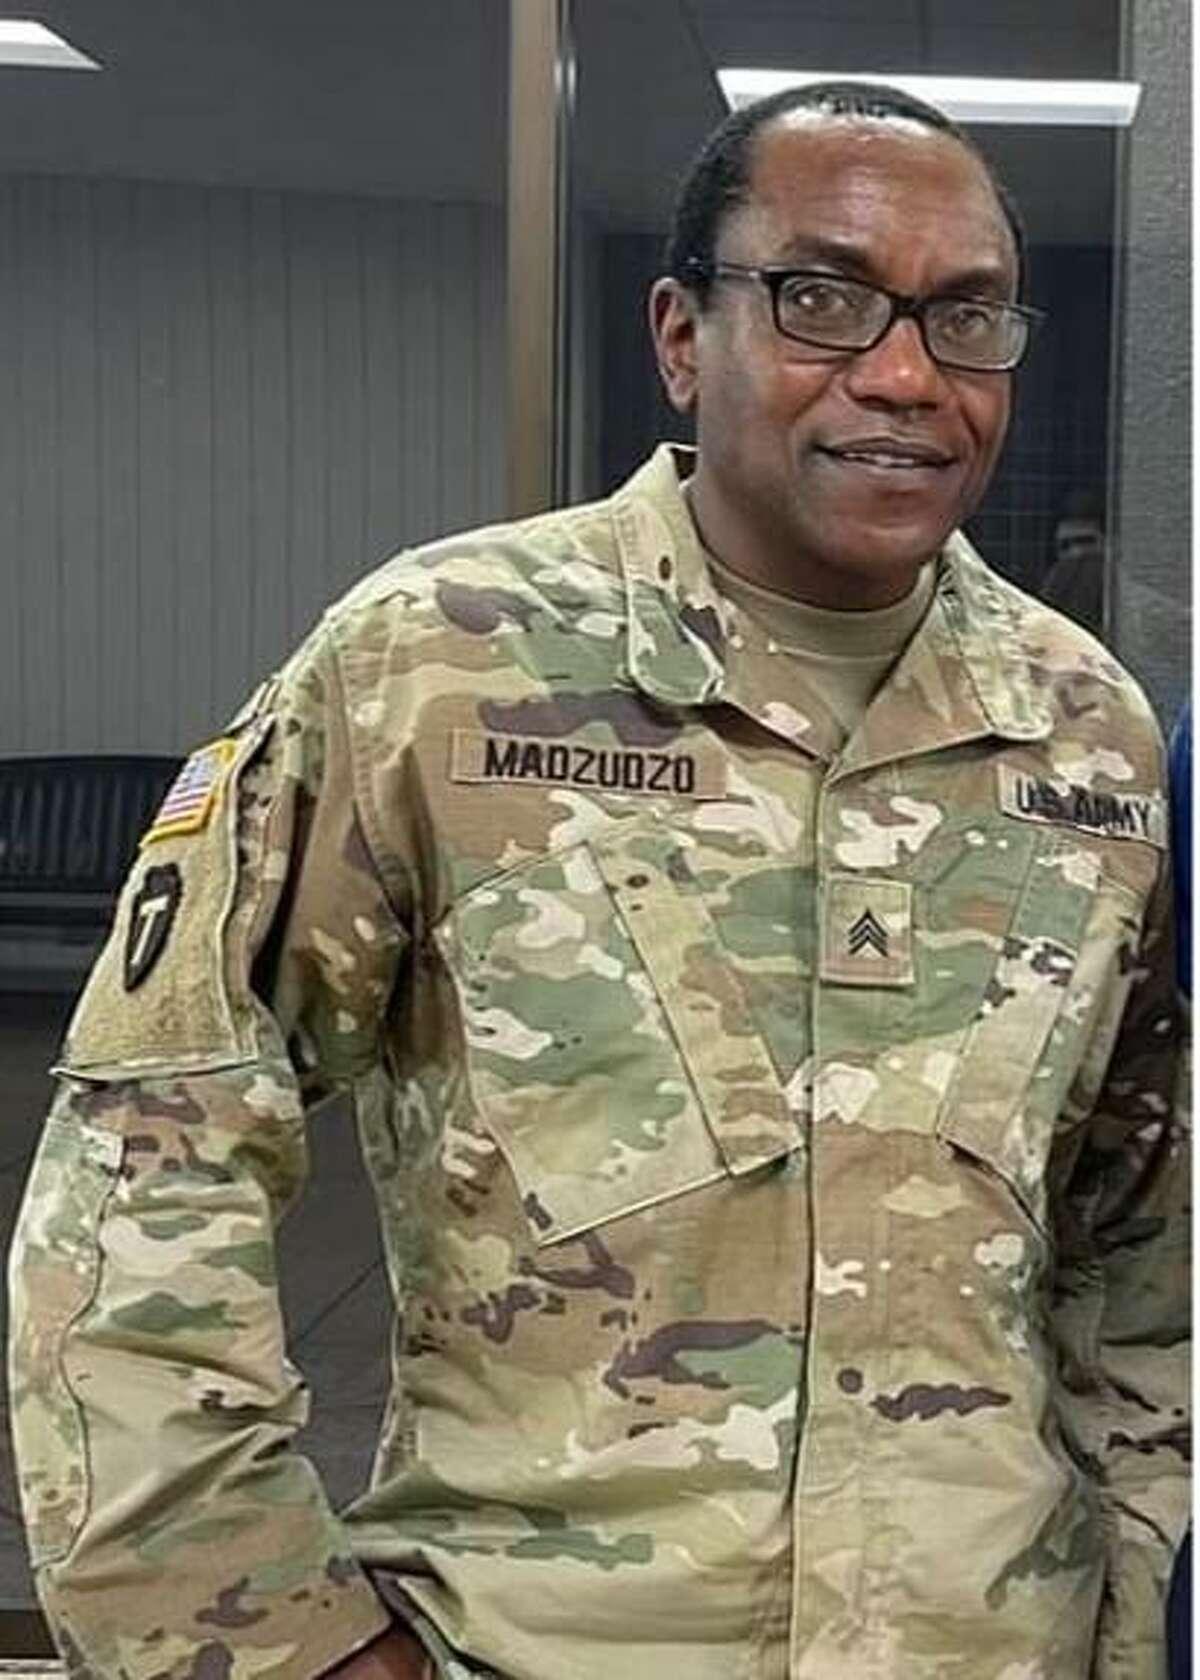 Sgt. Reggis Madzudzo, 52, of Boerne, died Tuesday of COVID-19, the Texas National Guard said.